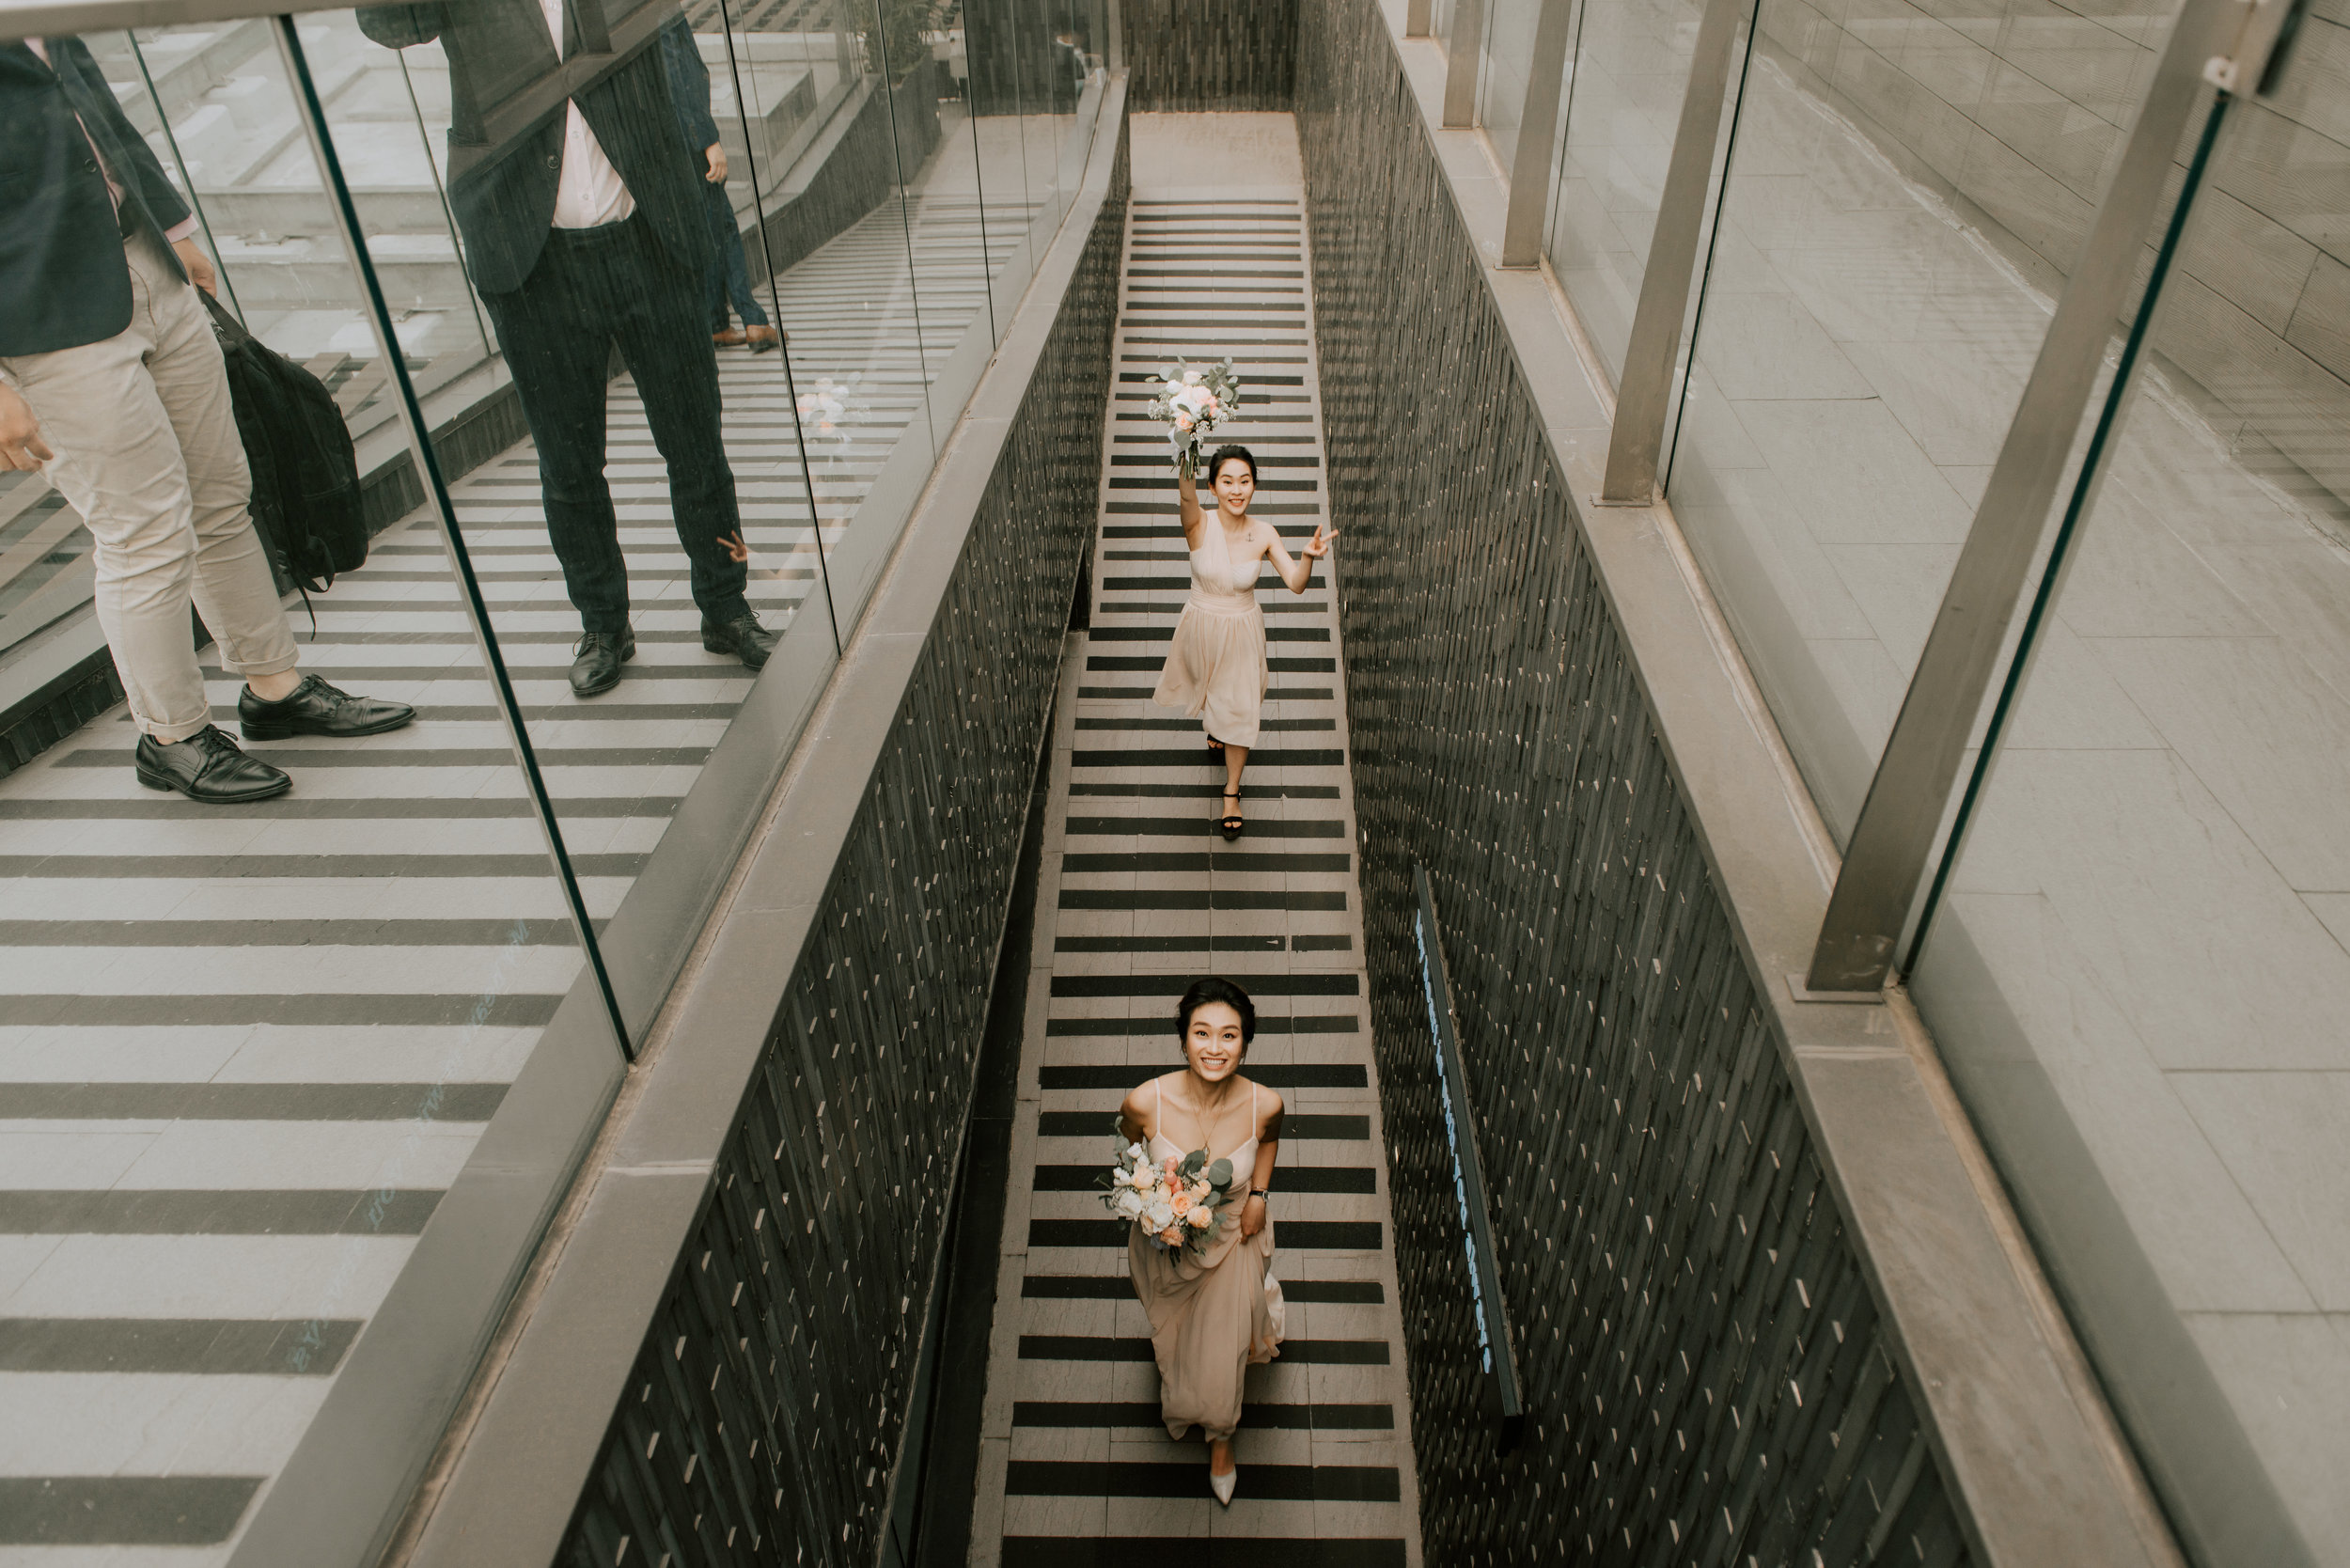 Mirrorwedding Destination Photographer TopofHanoi Duc Anh Hien Trang 172211.jpg